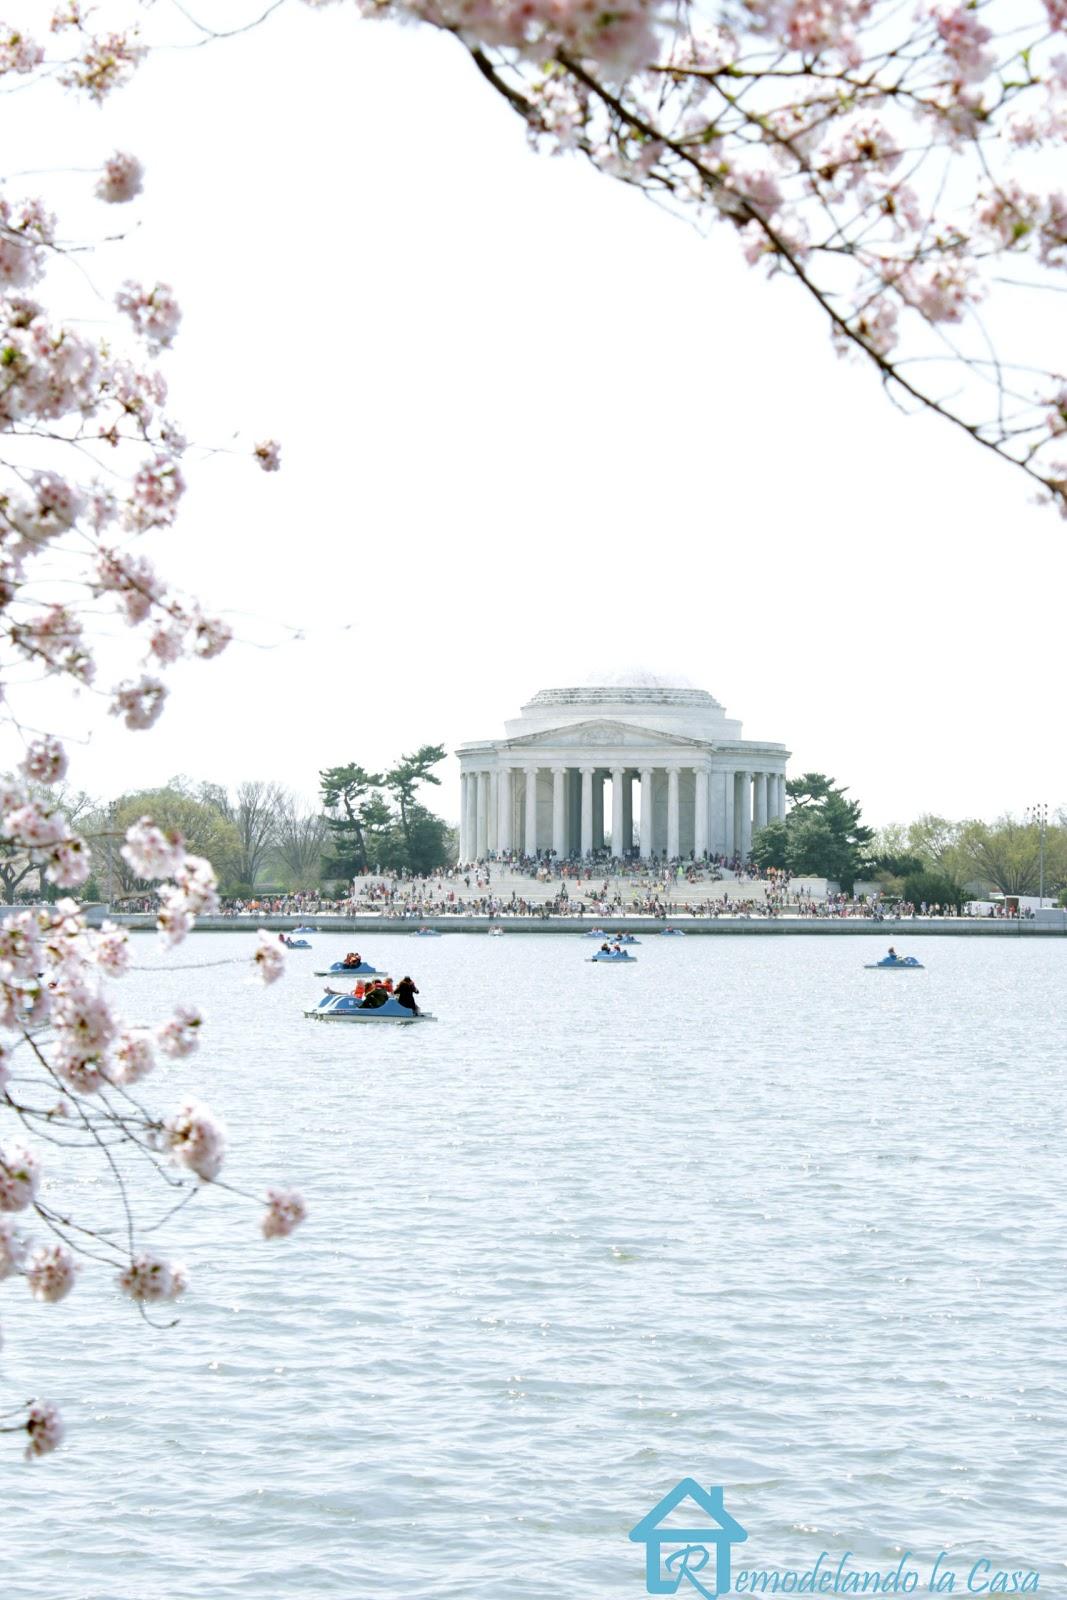 Jefferson memorial during cherry blossom festival in Washington DC